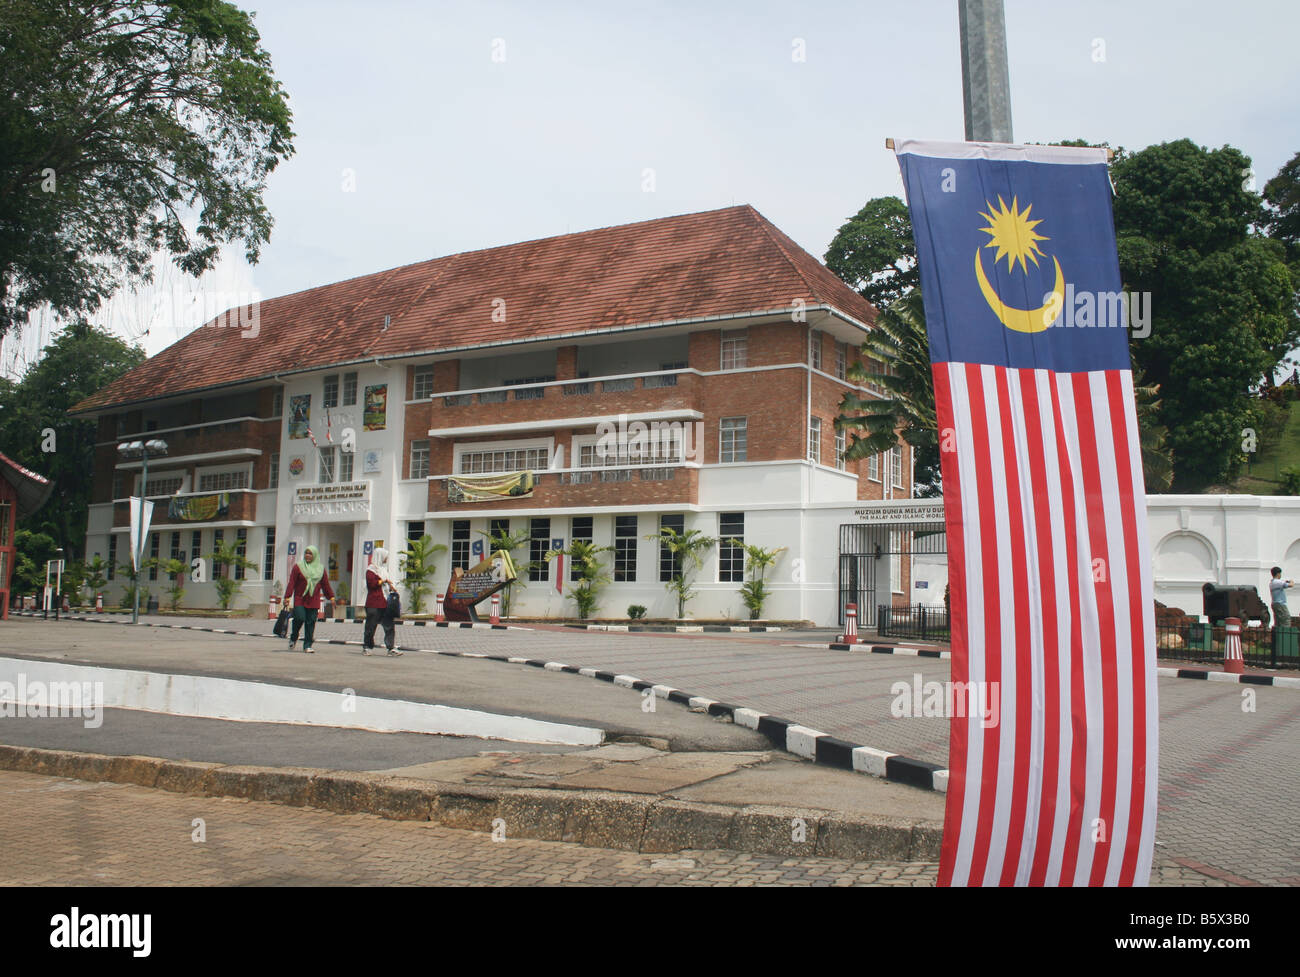 Malaysian flag and Malay and Islamic World Museum Melaka Malaysia  April 2008 - Stock Image